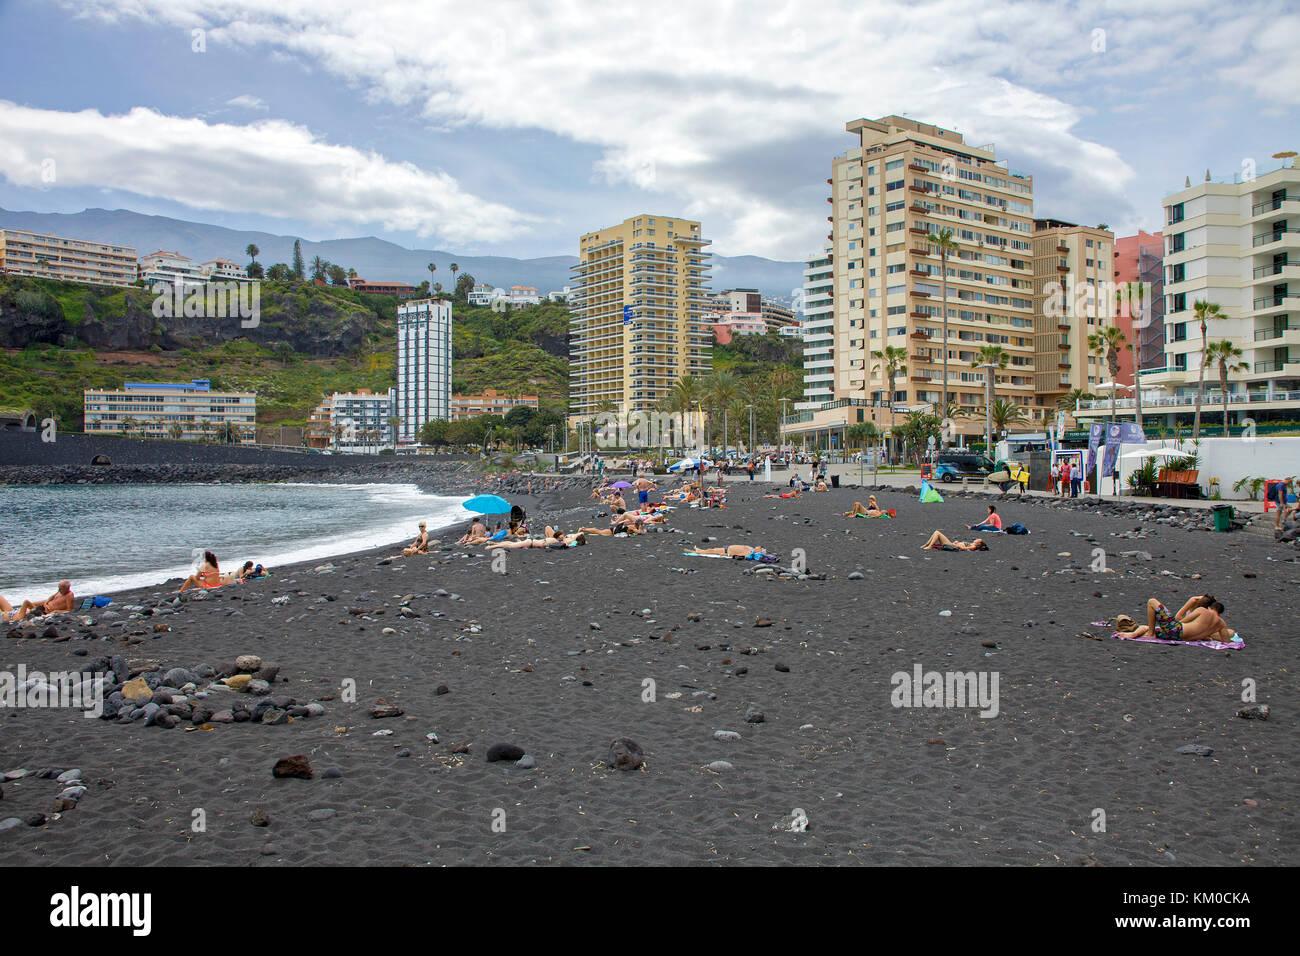 Beach of Puerto de la Cruz, north side of Tenerife island, Canary islands, Spain - Stock Image